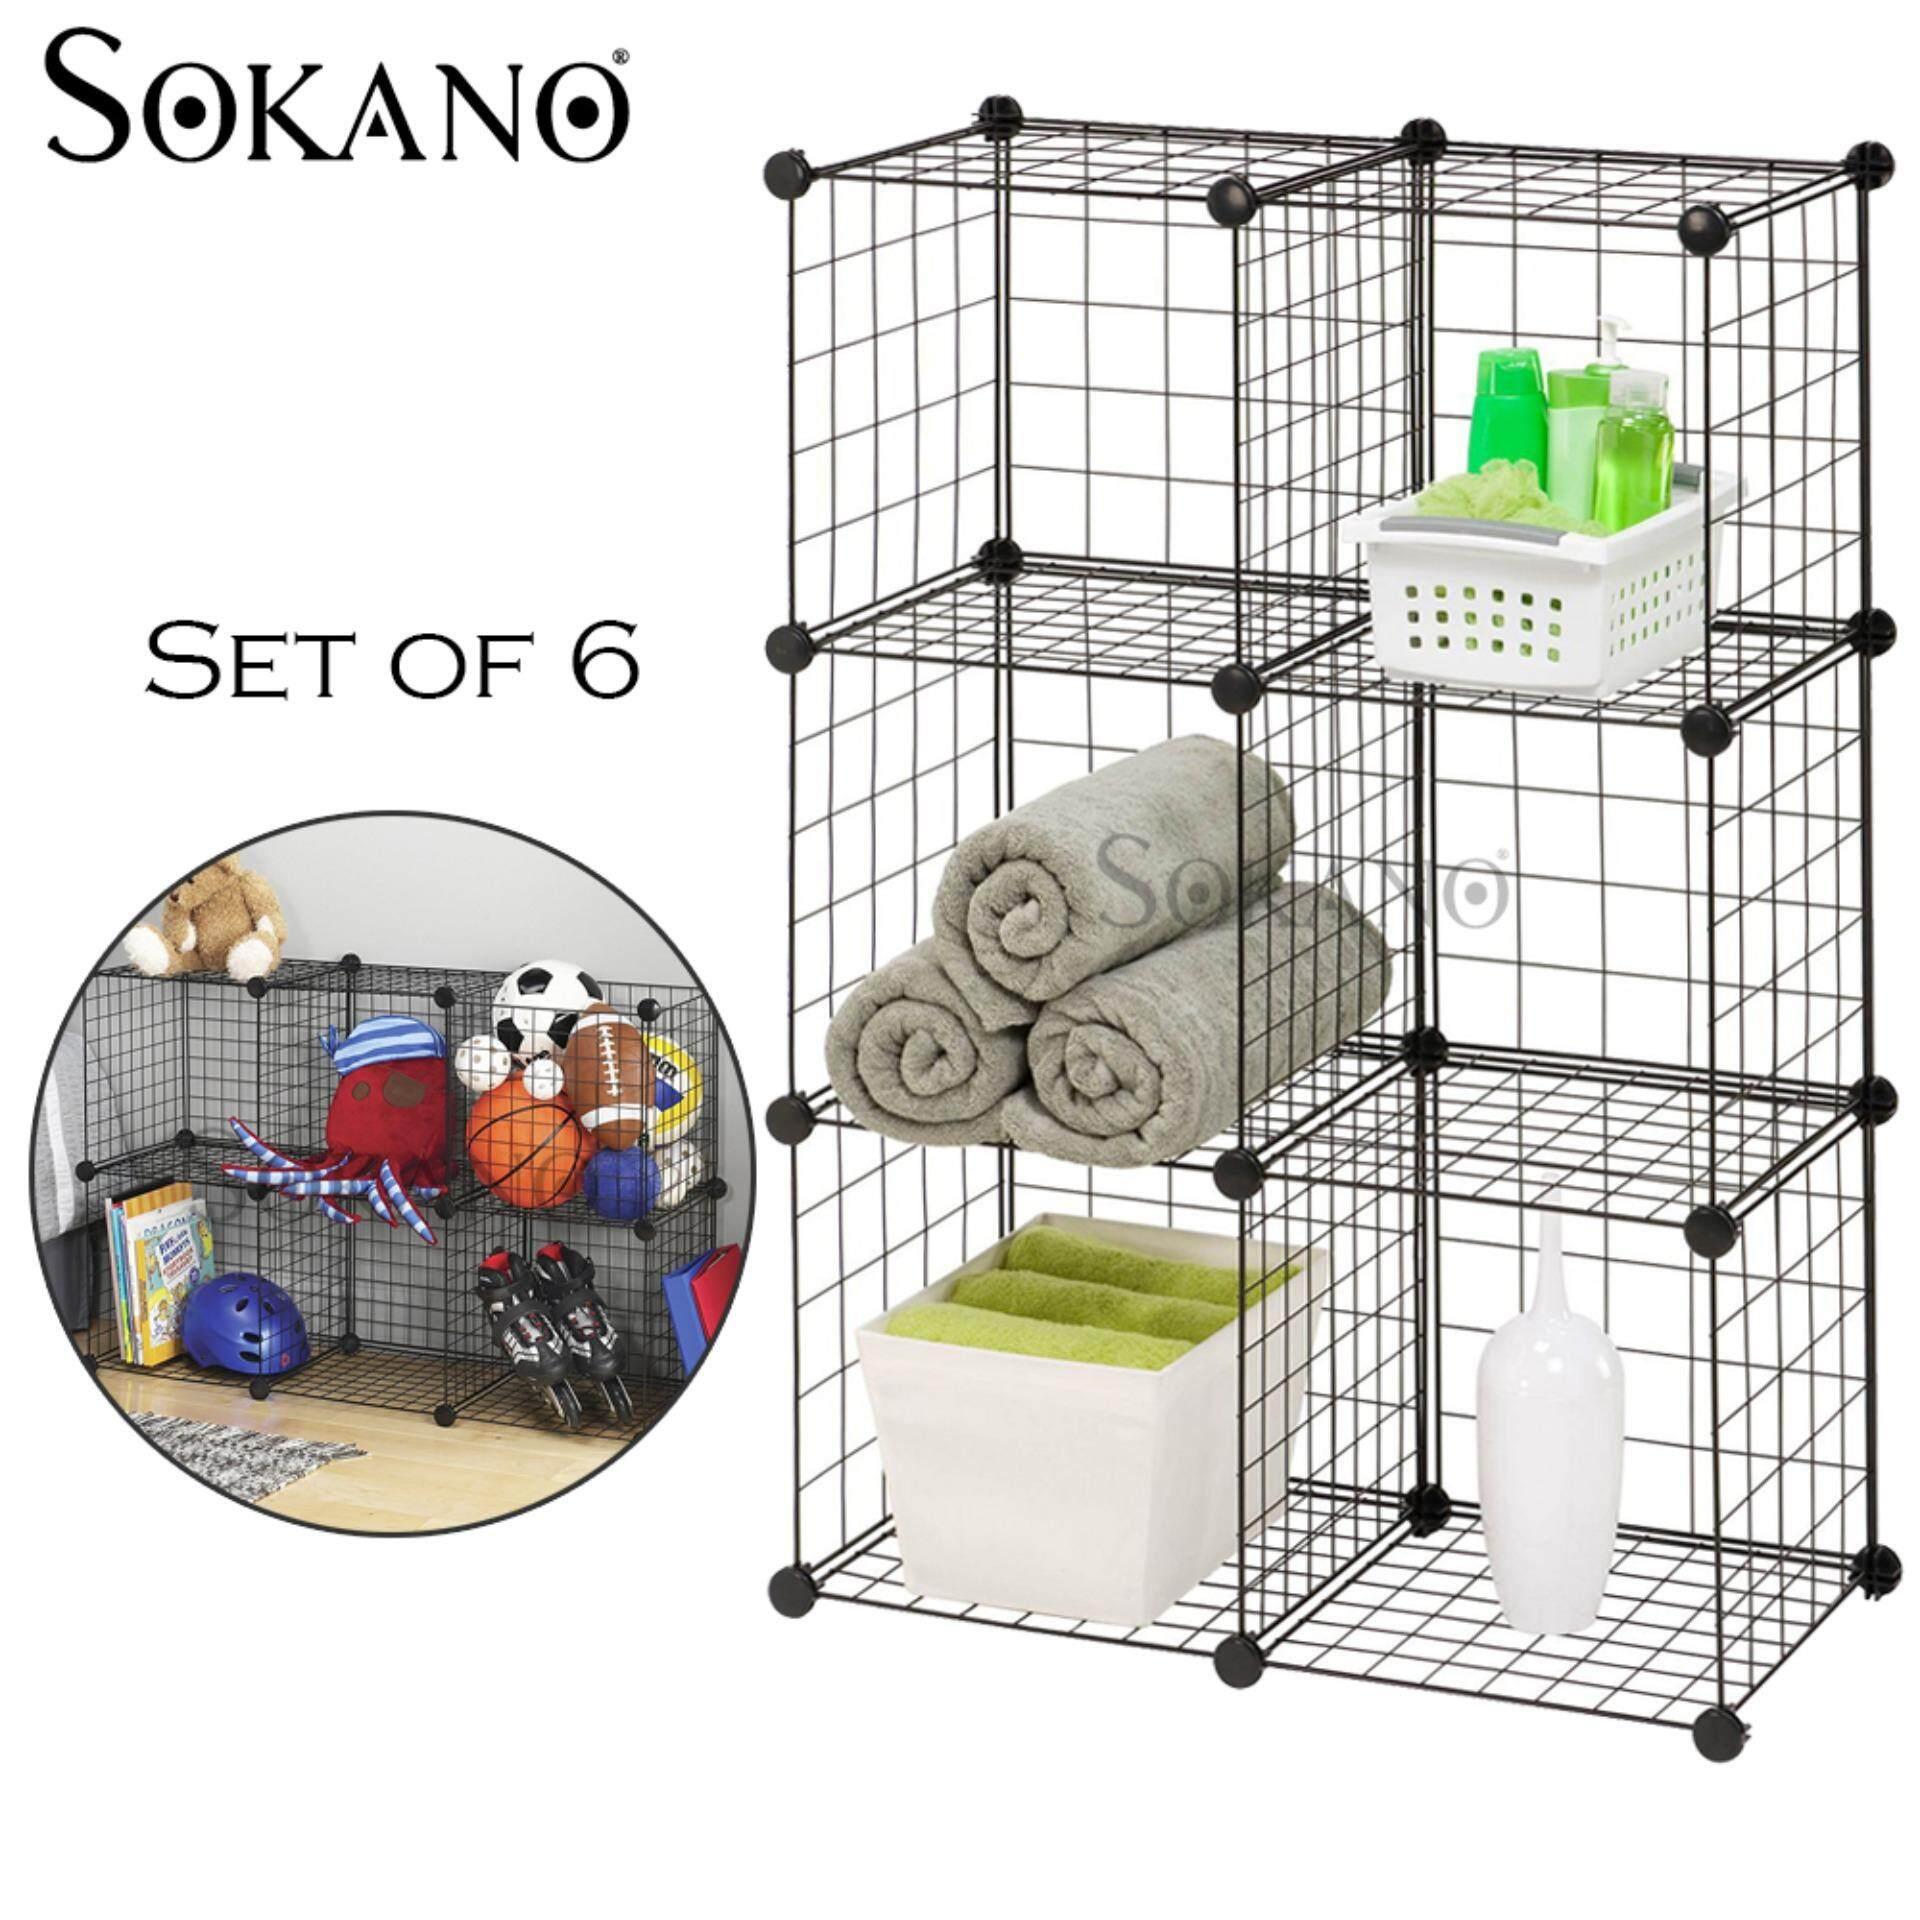 SOKANO Set of 6 Wired Mesh Storage Cube- Black